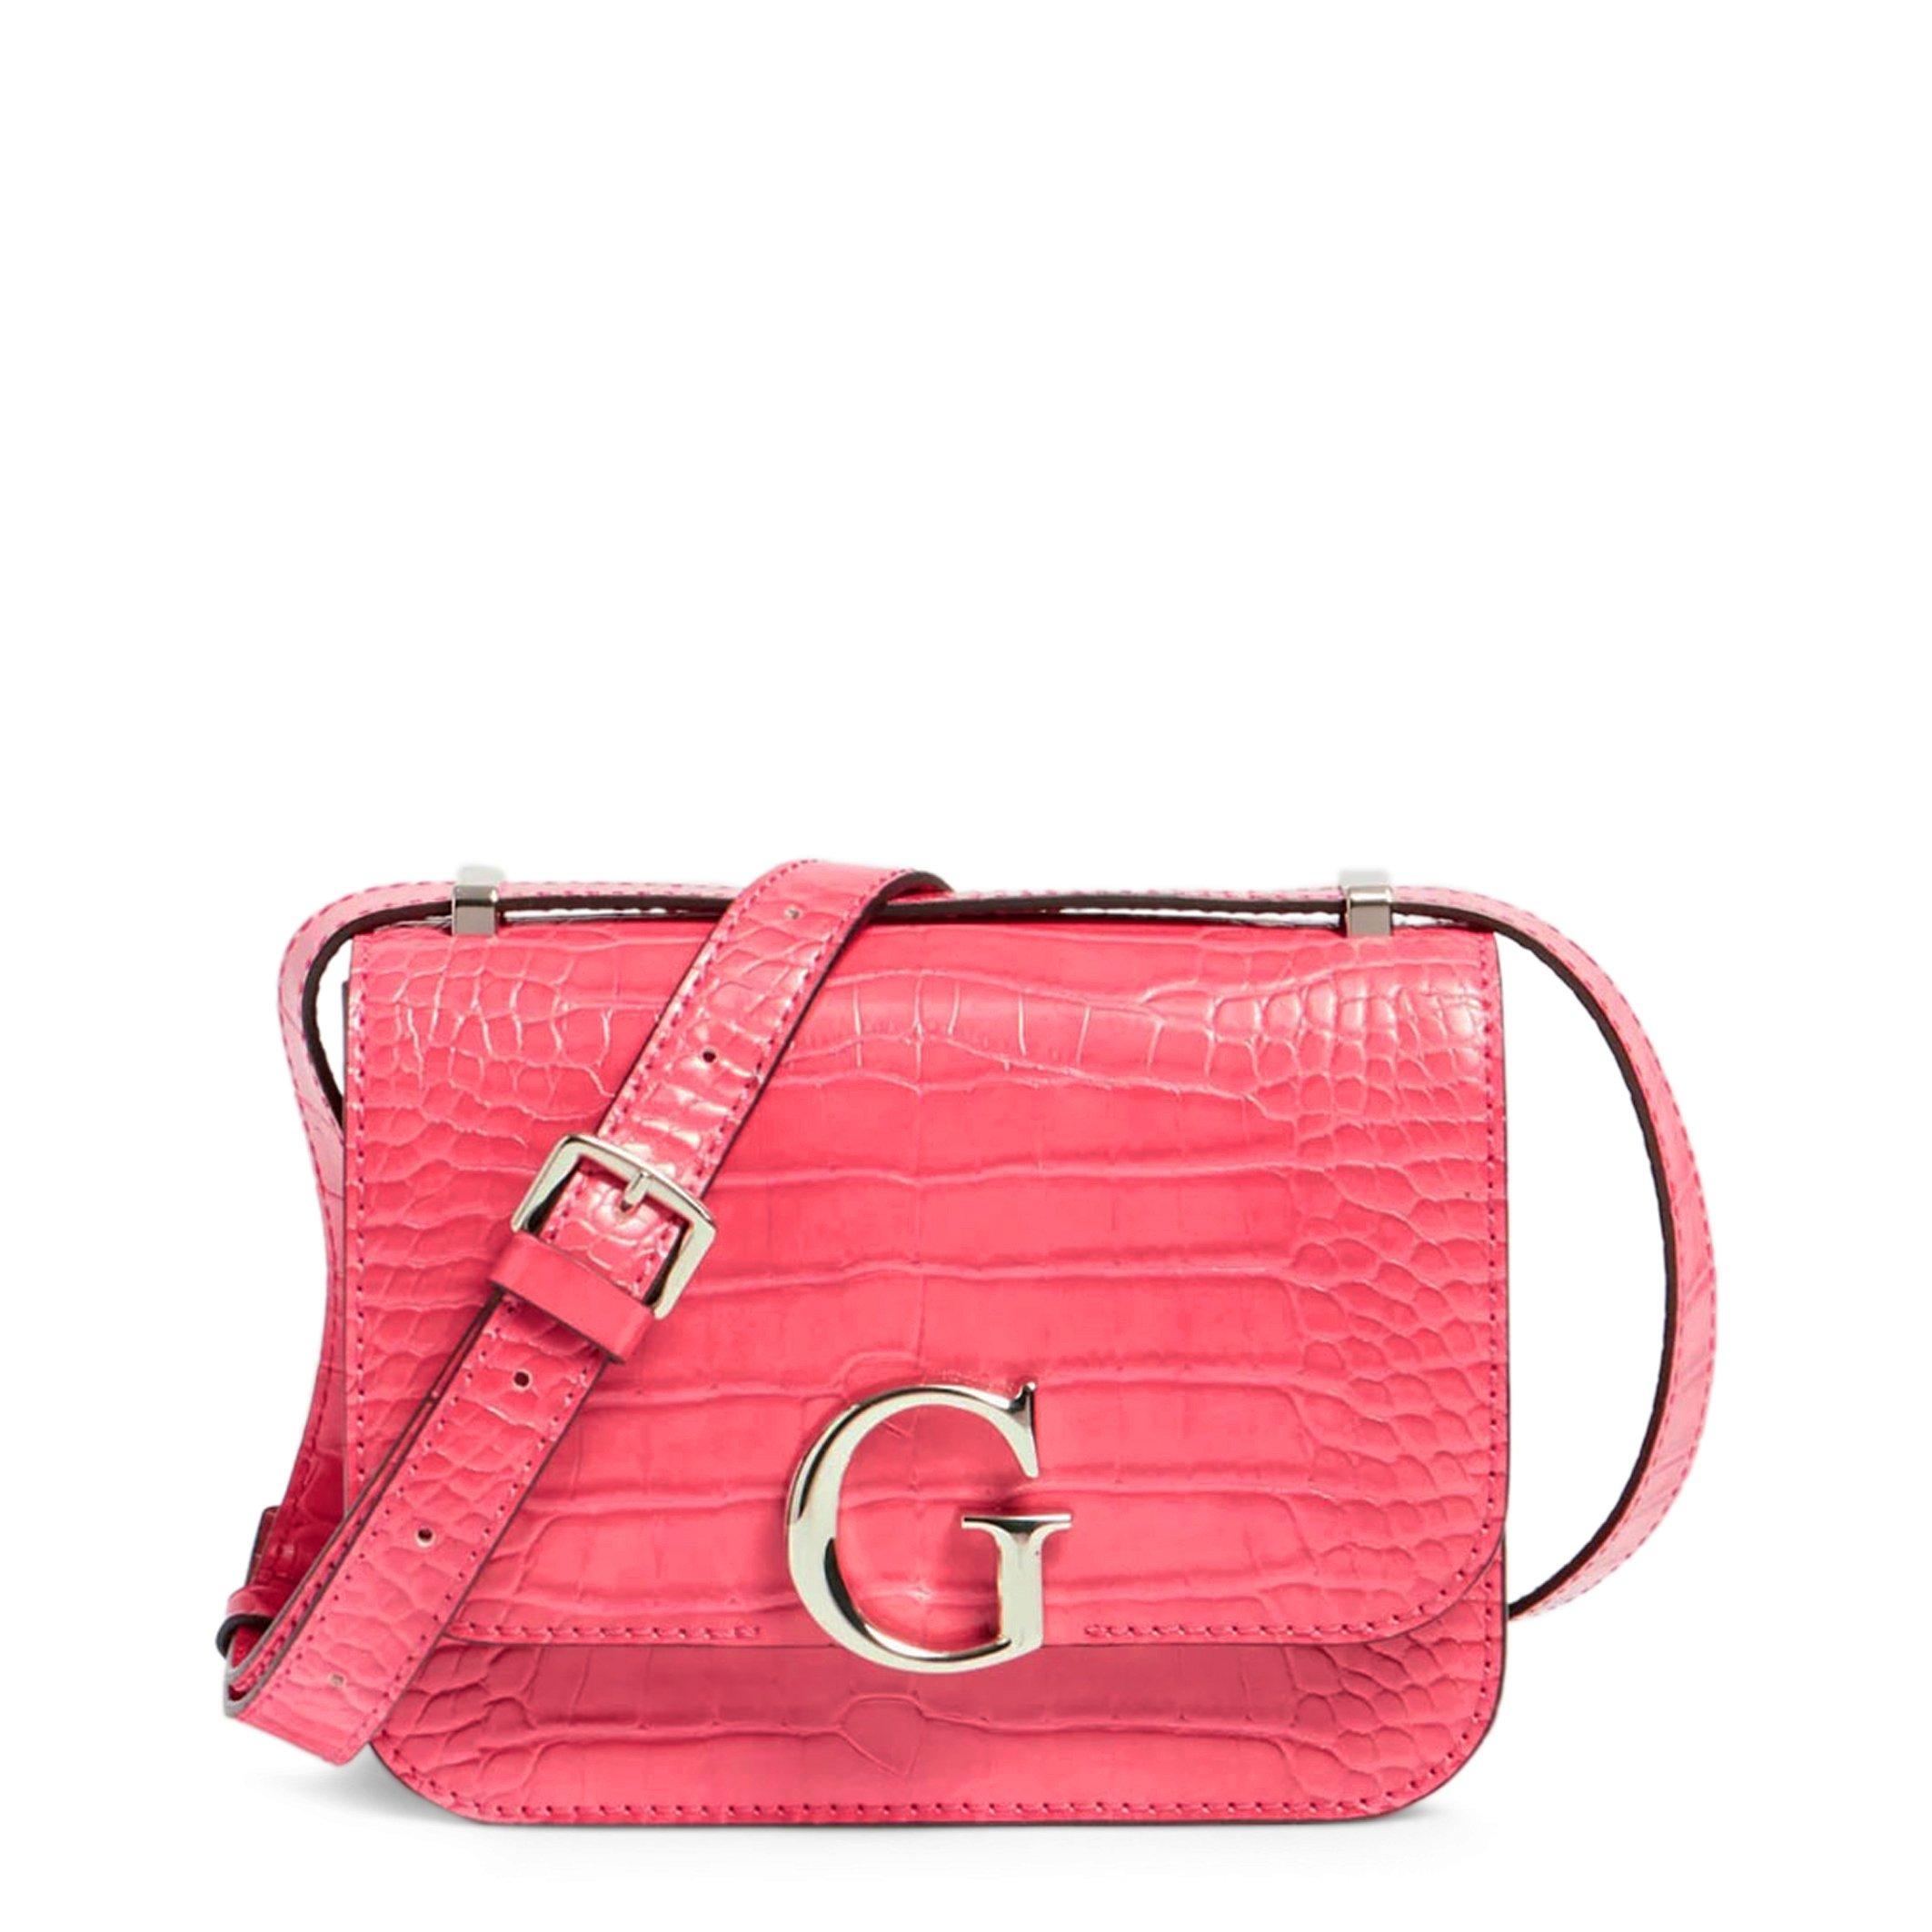 Guess Women's Crossbody Bag Various Colours Corily_HWCG79_91780 - pink NOSIZE